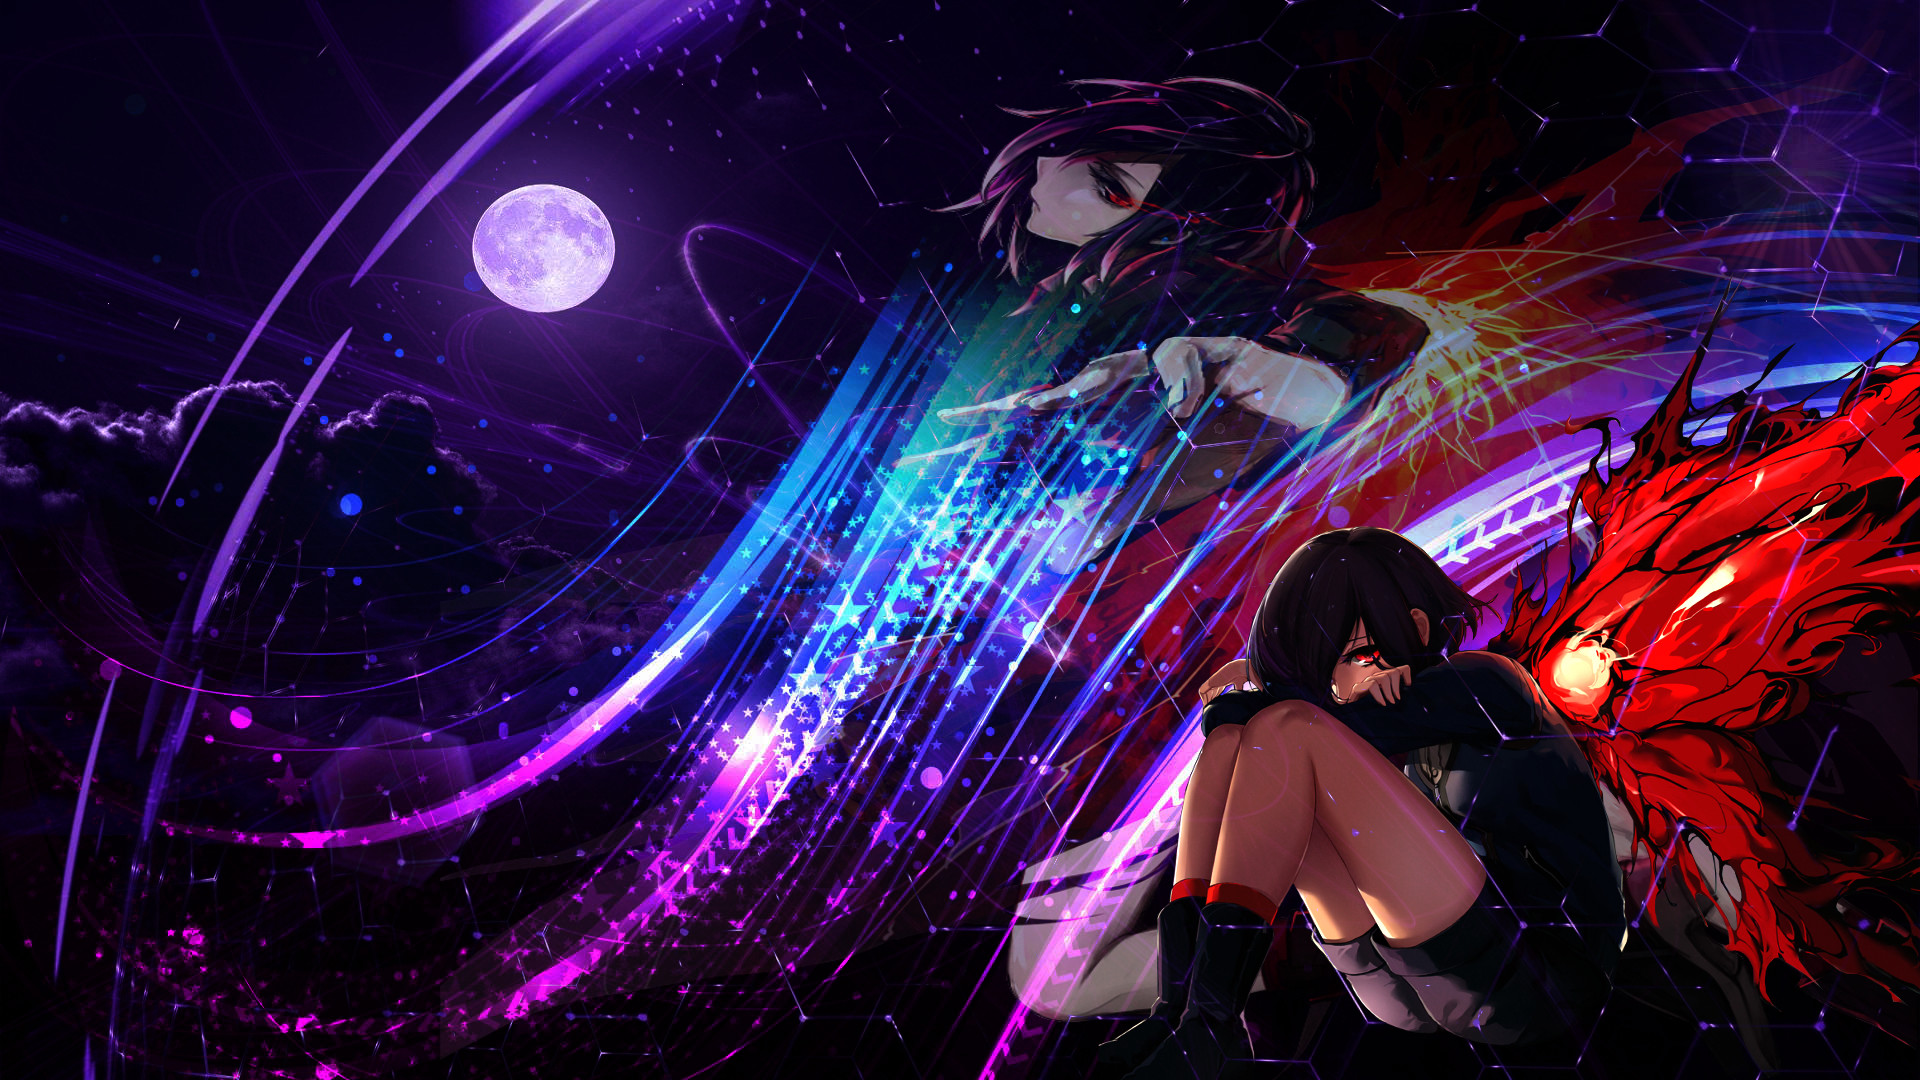 Tokyo ghoul touka wallpaper 84 images - Tokyo anime wallpaper ...